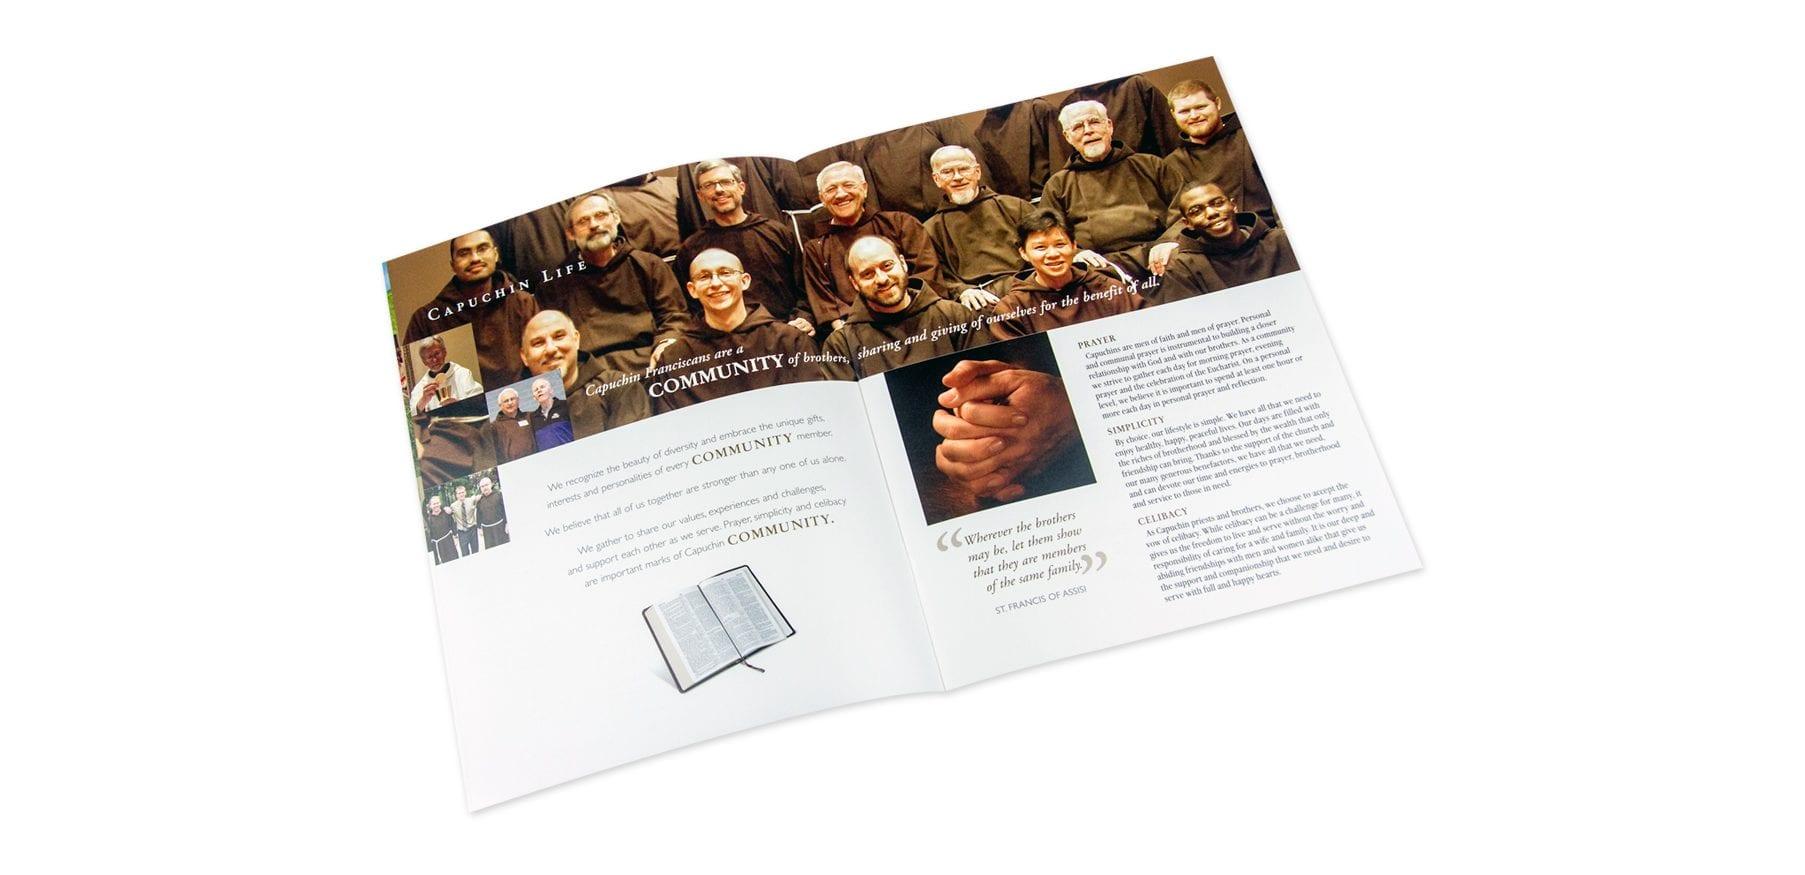 Capuchin Franciscan Friars